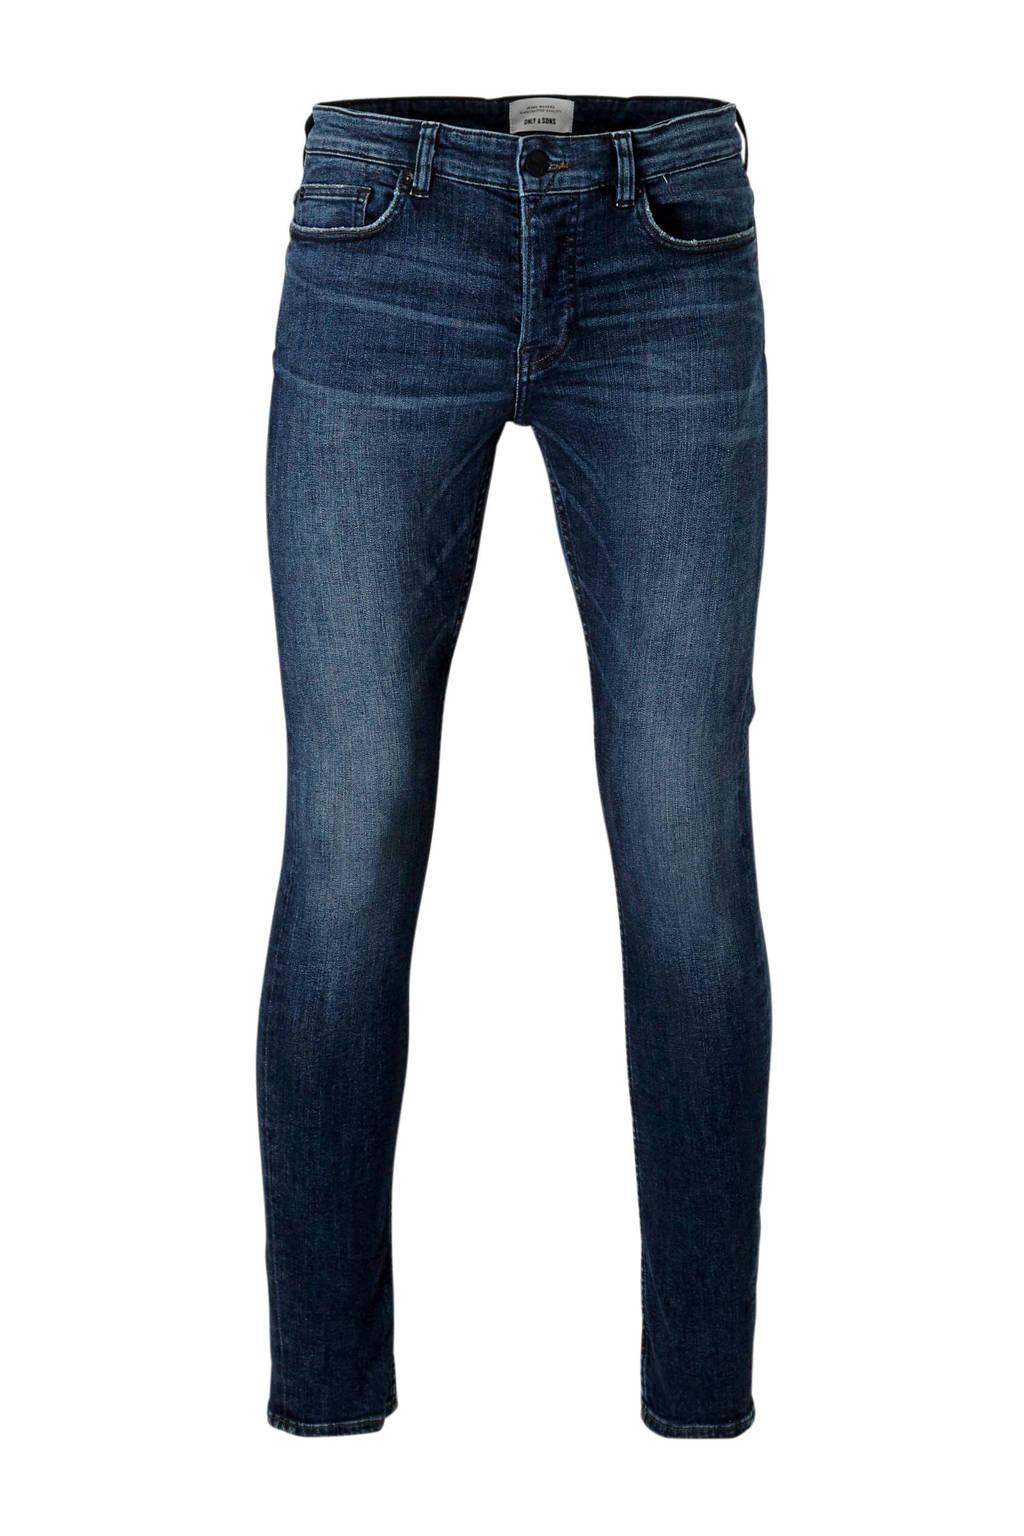 Only & Sons  slim slim fit jeans, Dark denim